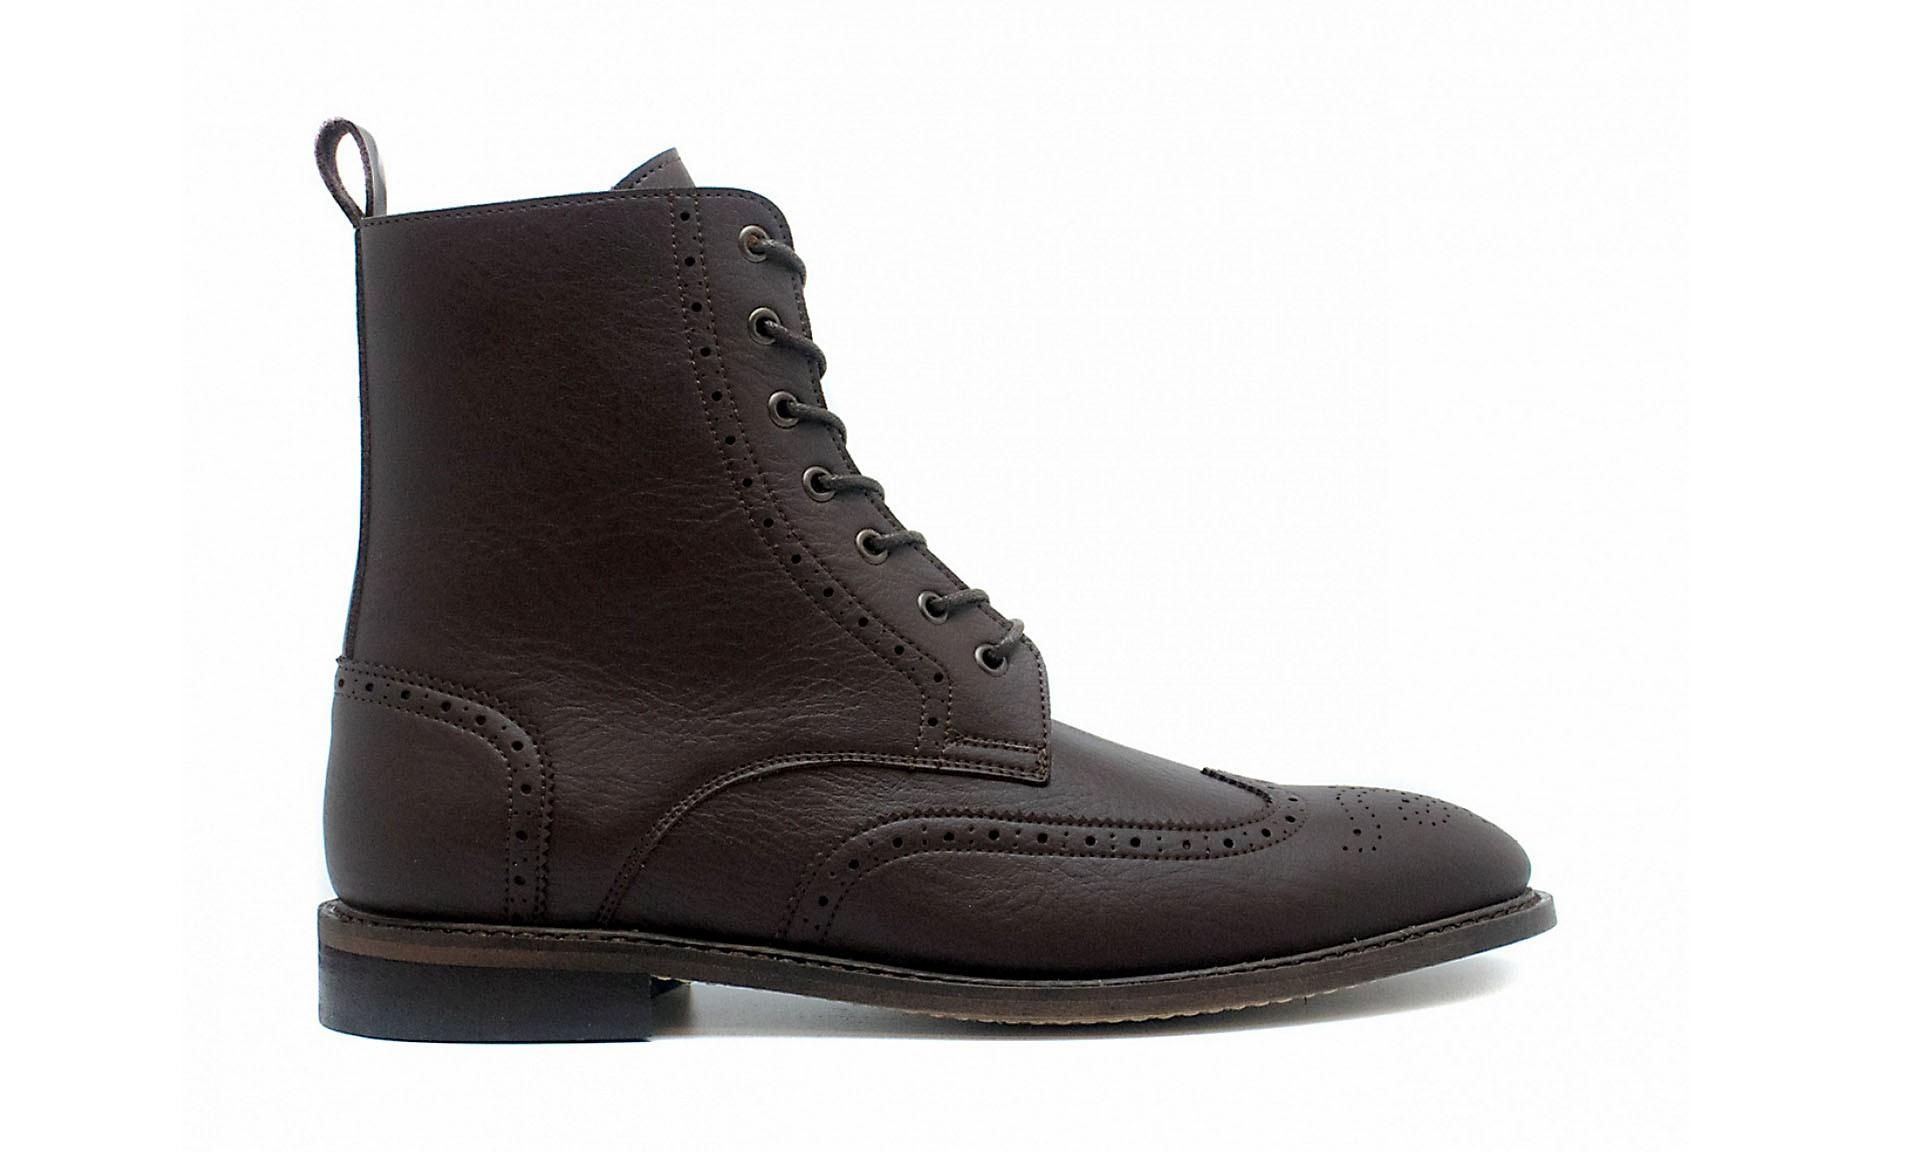 Vegan Brown Vegane Avesu Shoes HerrenstiefelNae Àlex tQxCrshdB